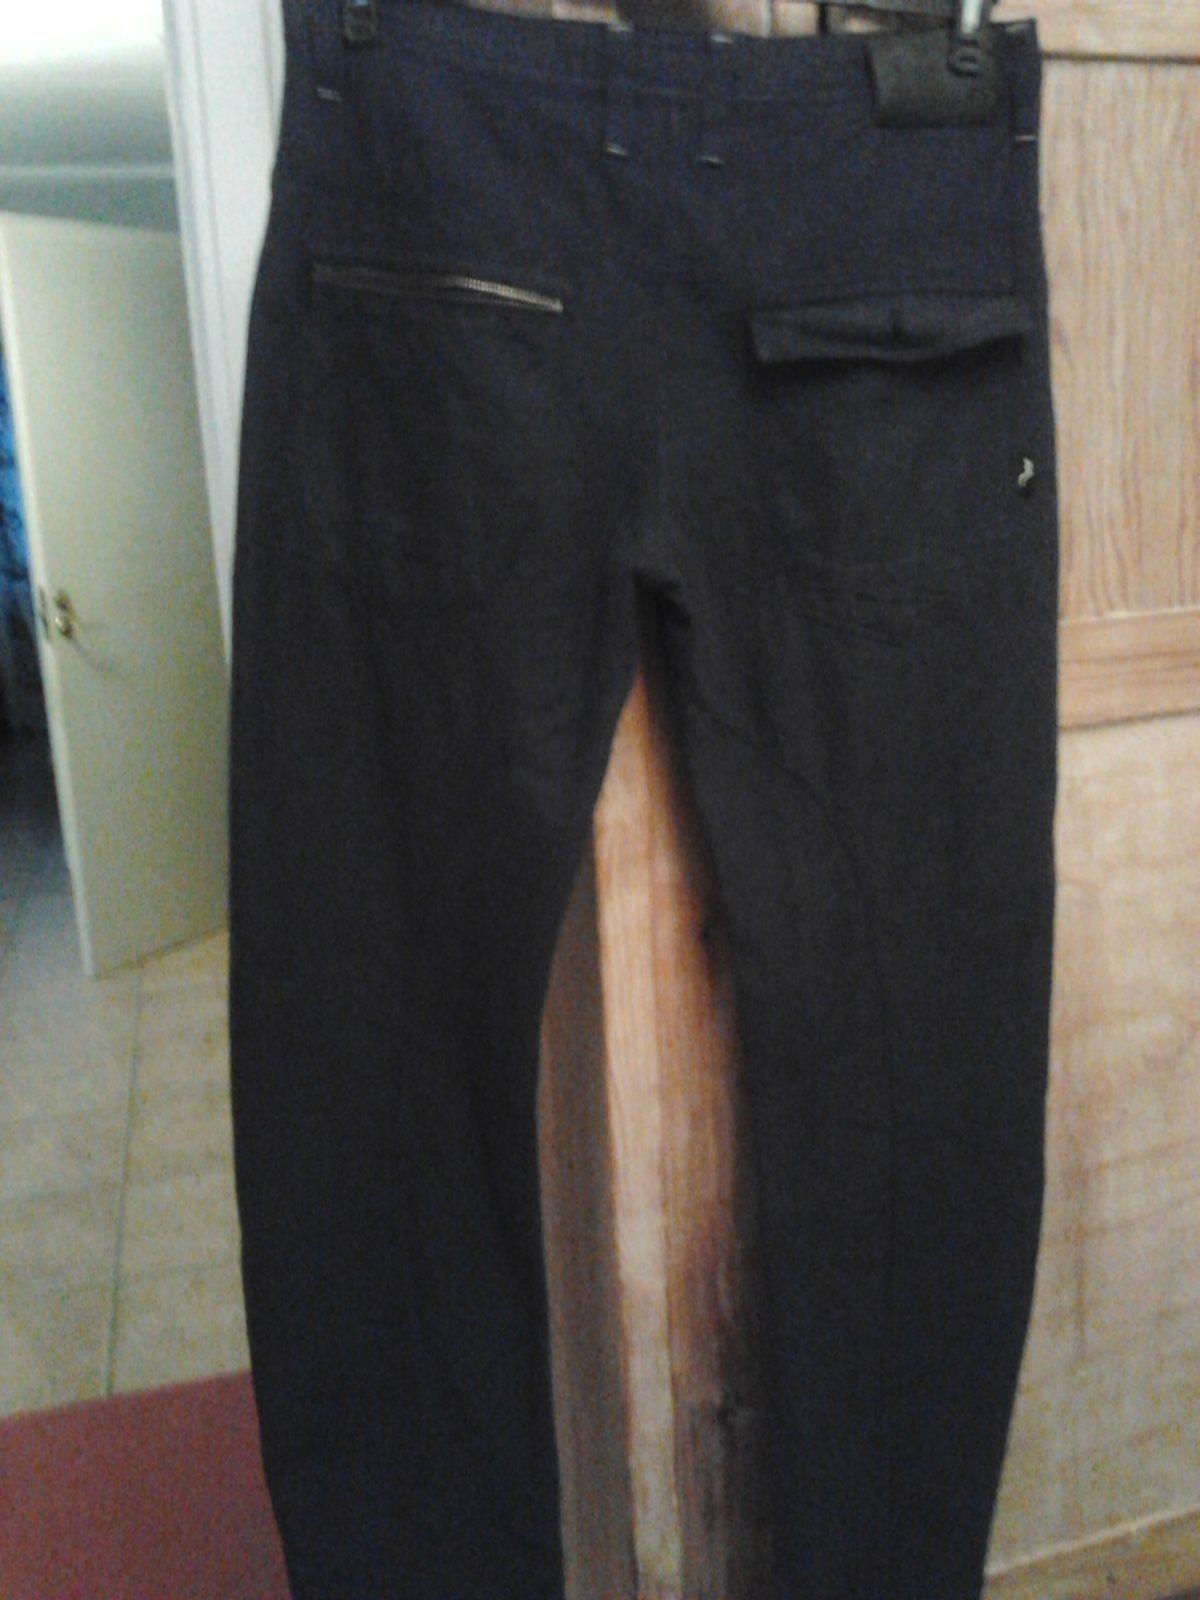 Jeans denim laundry färg svart storlek 36/34